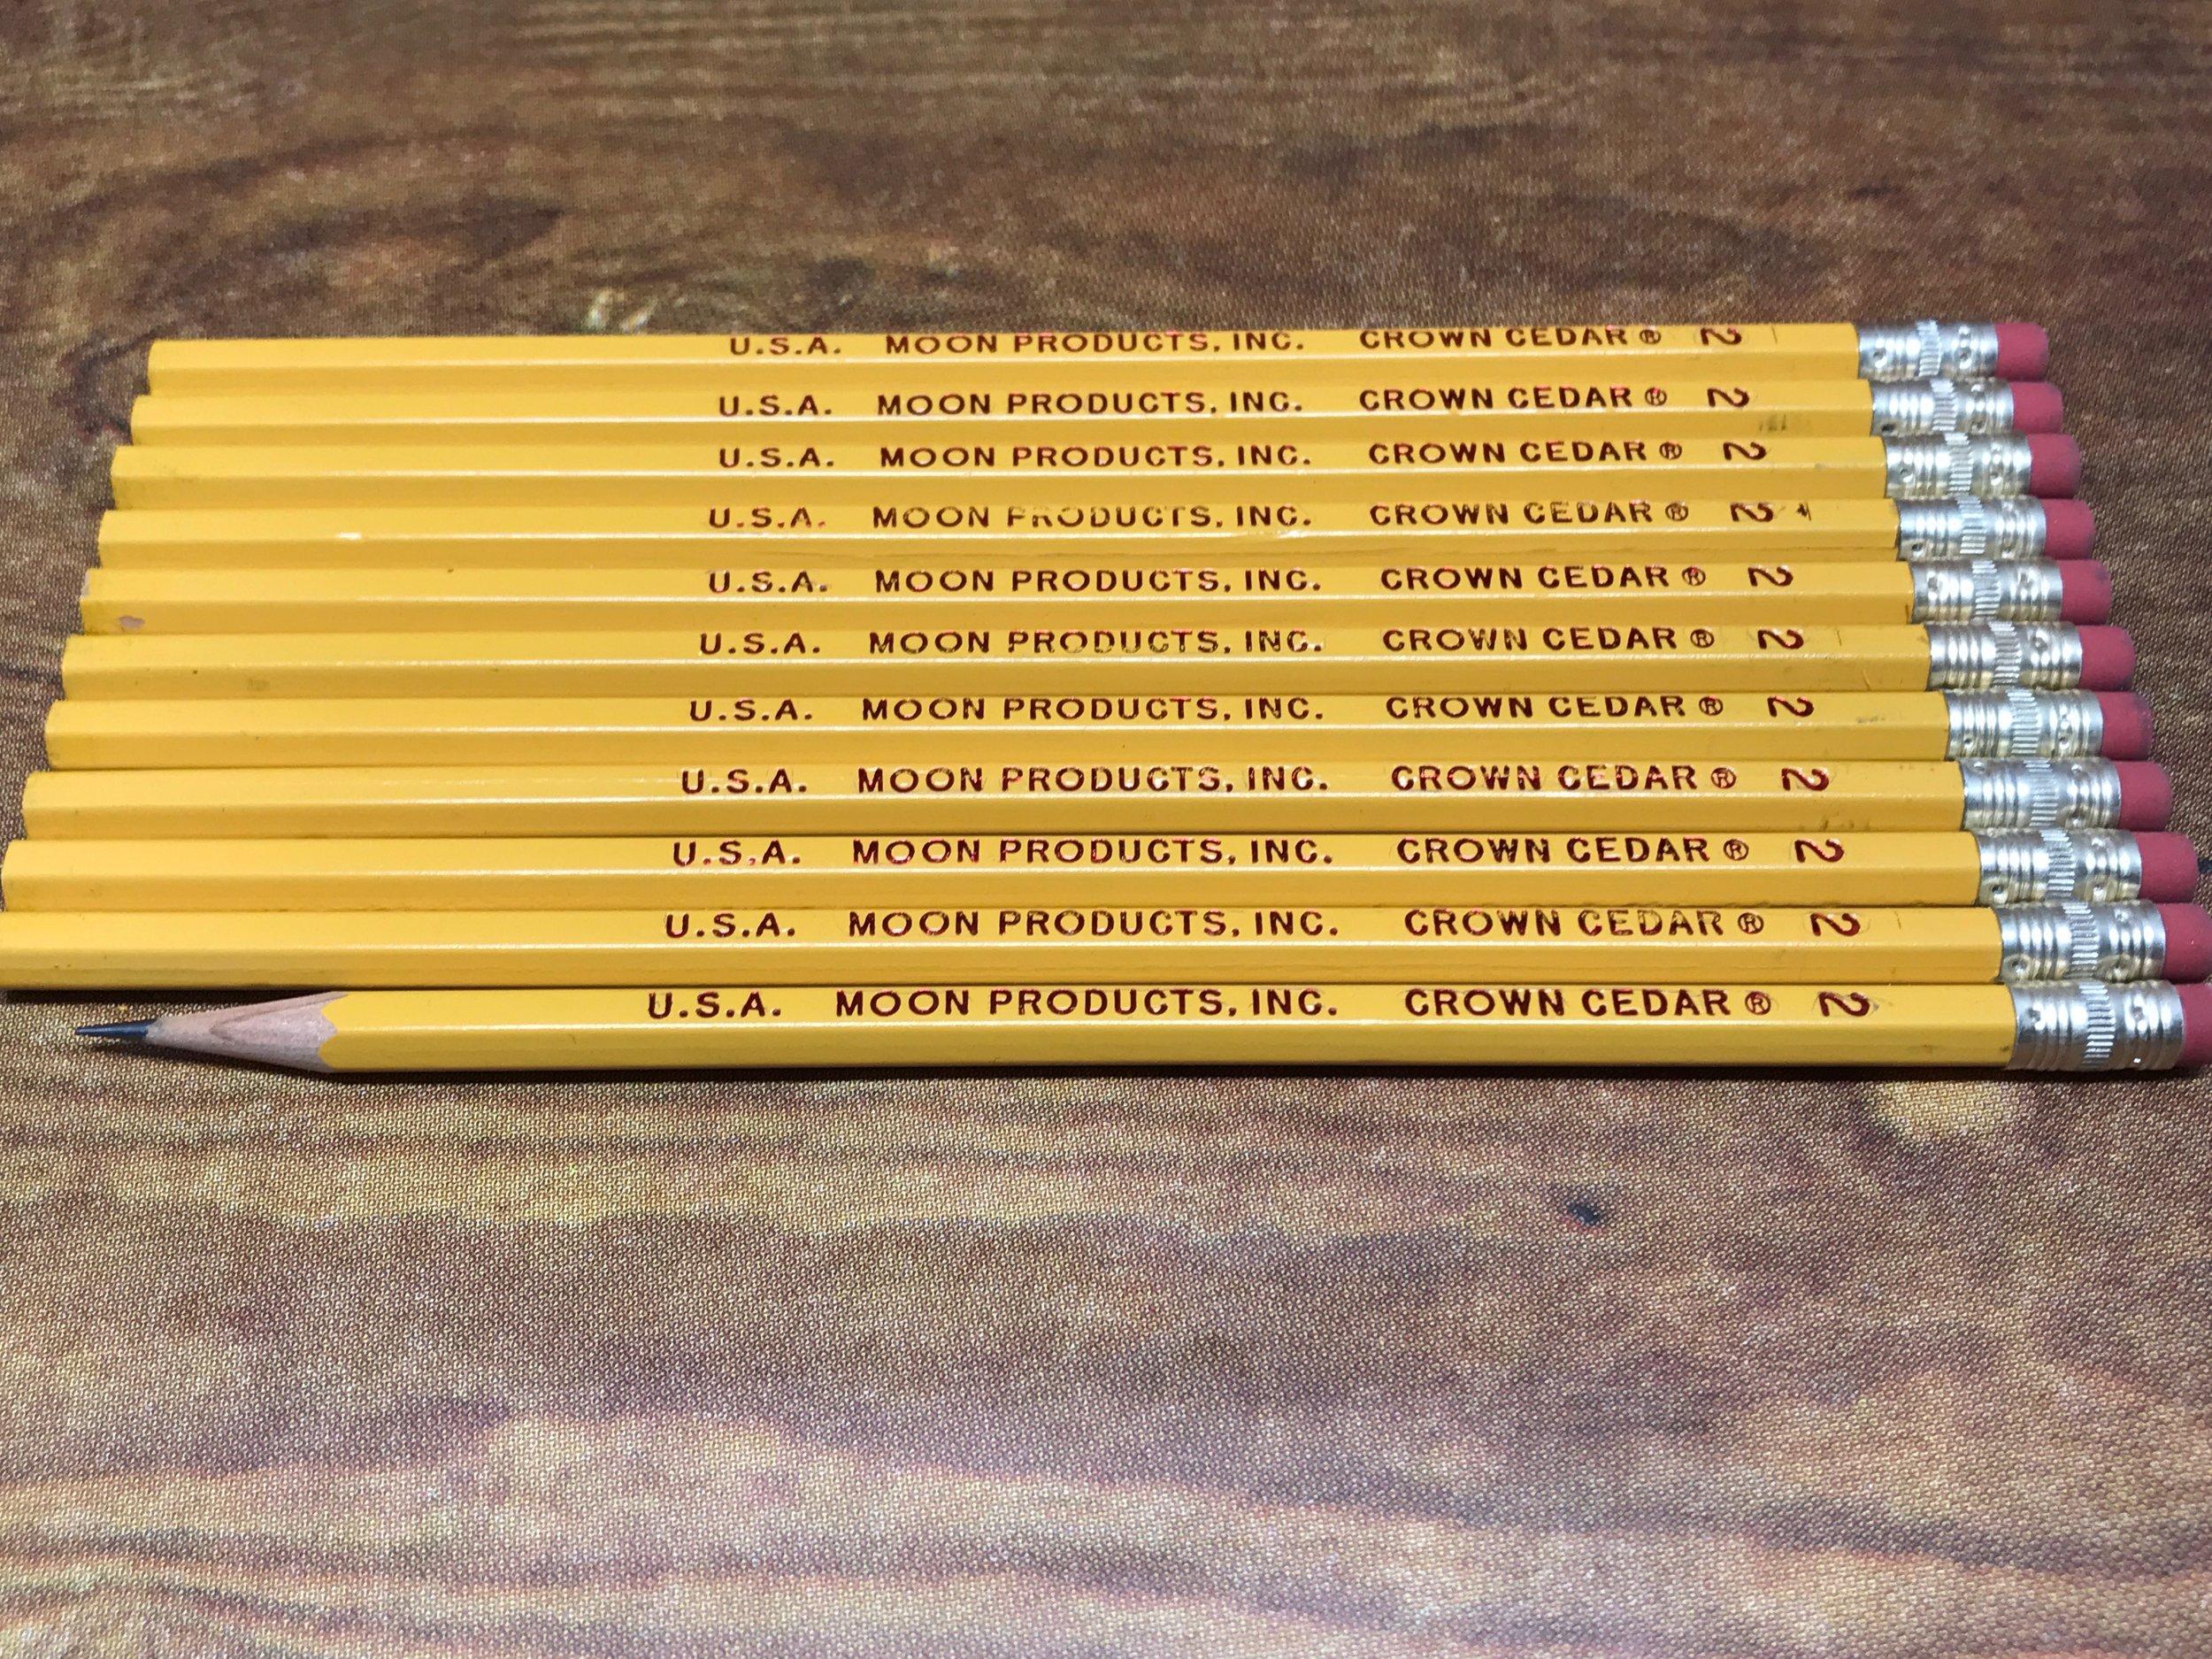 moon-products-crown-cedar-pencil-4.jpg